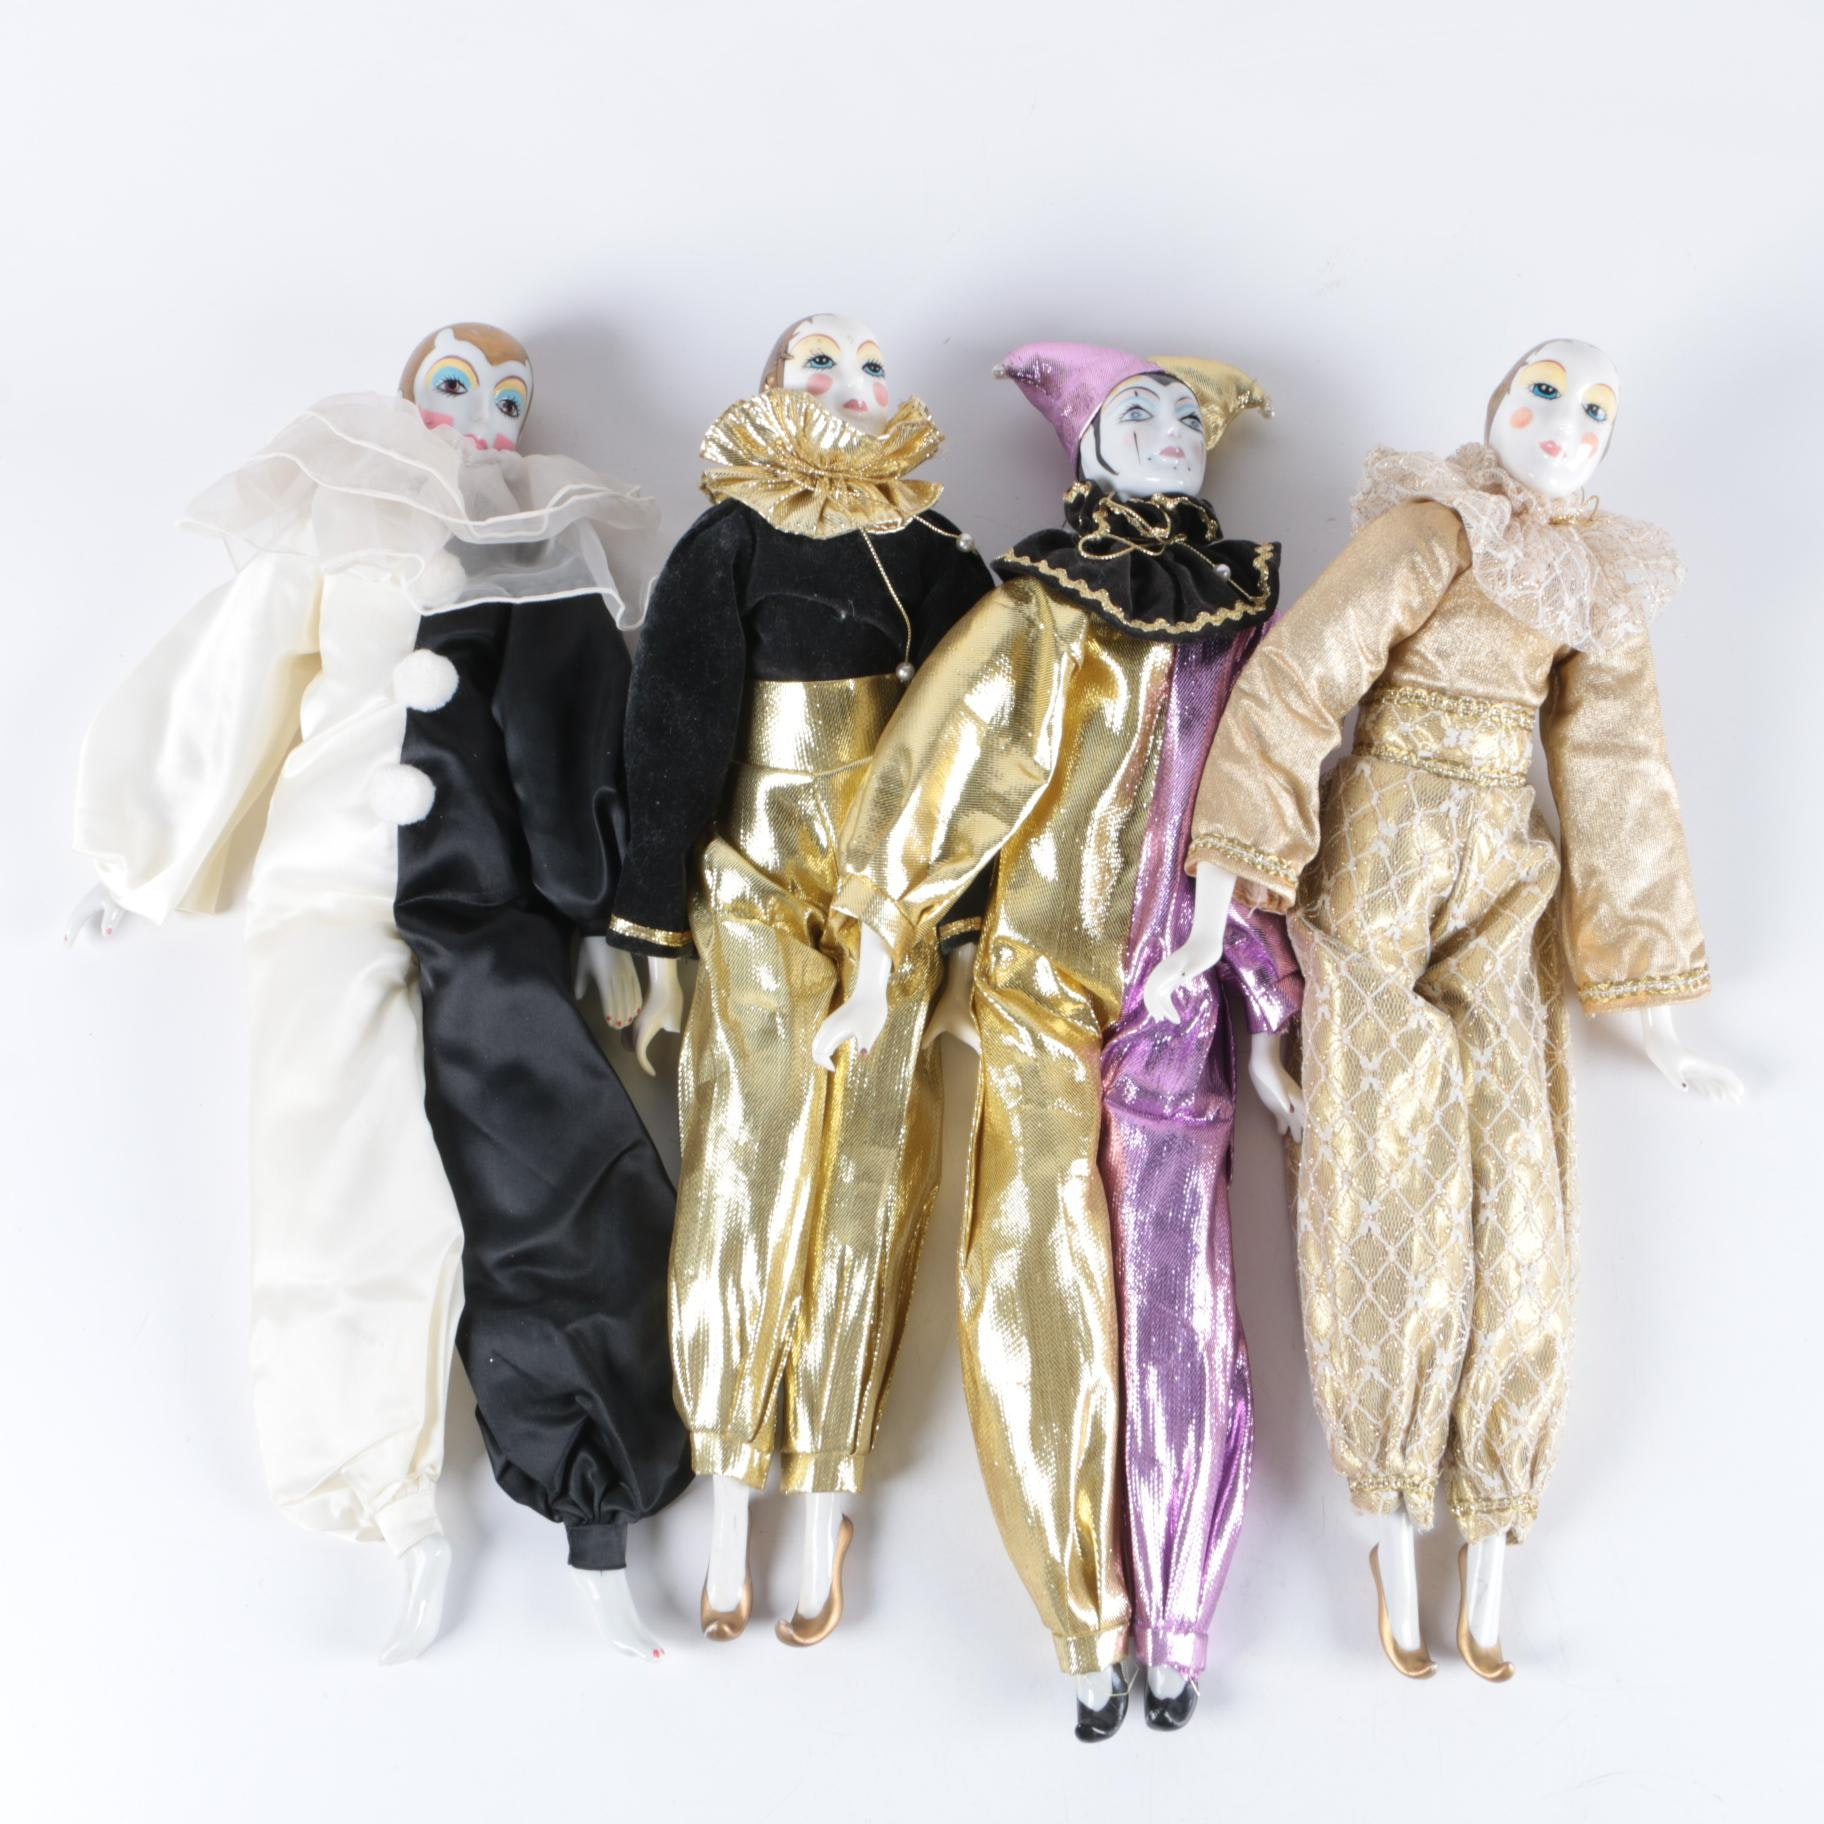 Vintage Russ Porcelain Pierrot Dolls